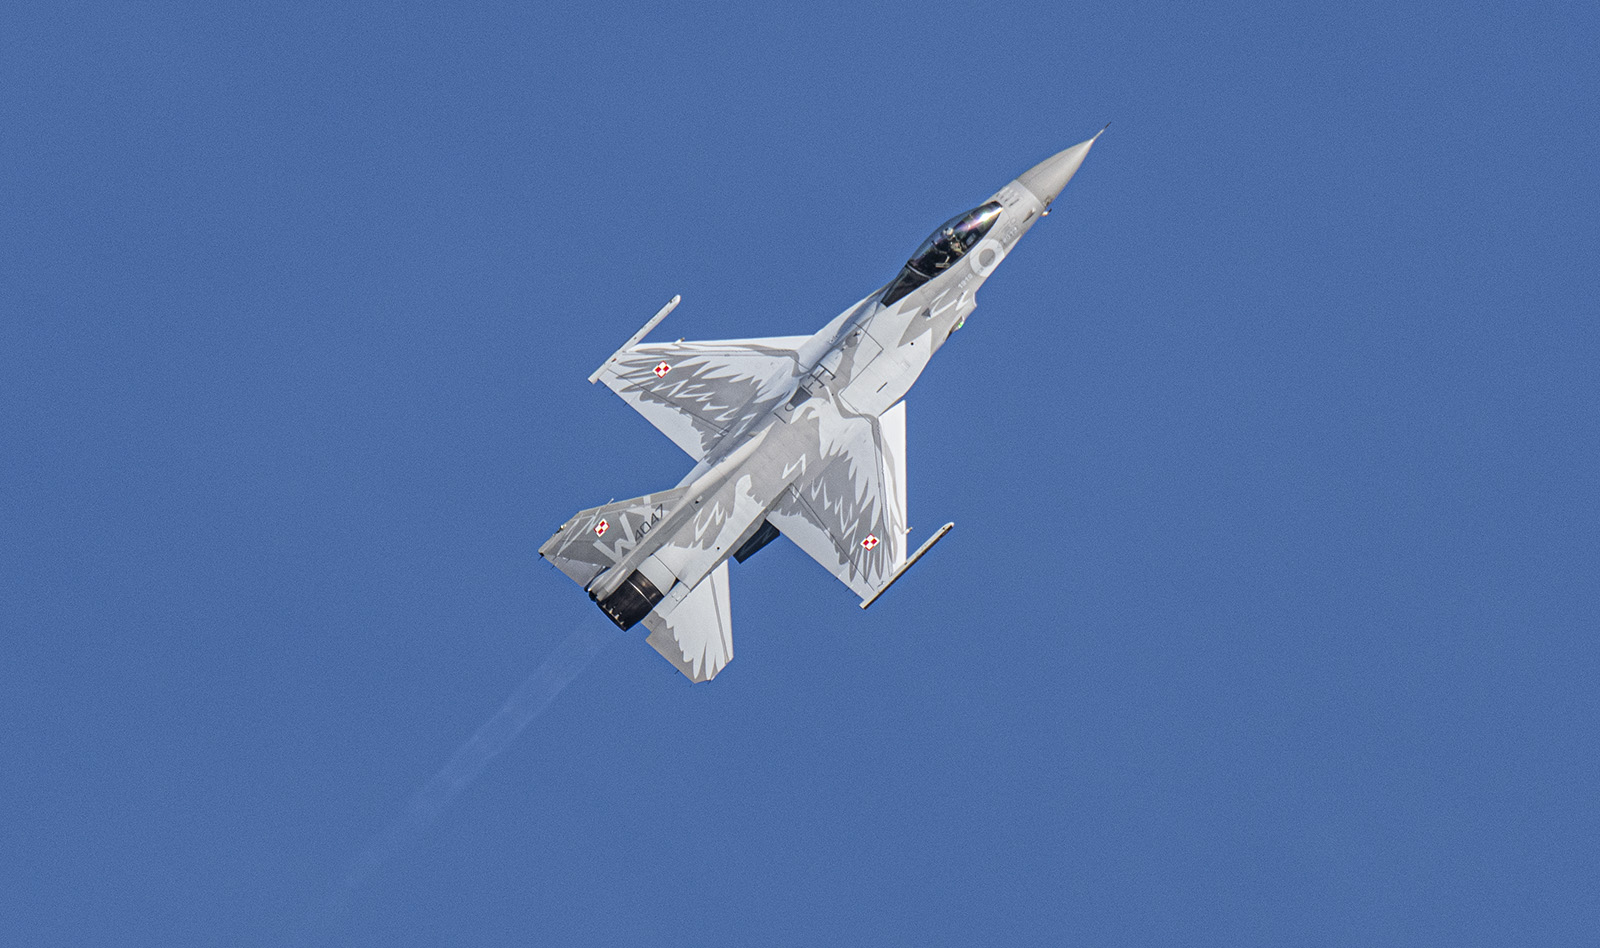 Polish Air Force F-16C Block 52+